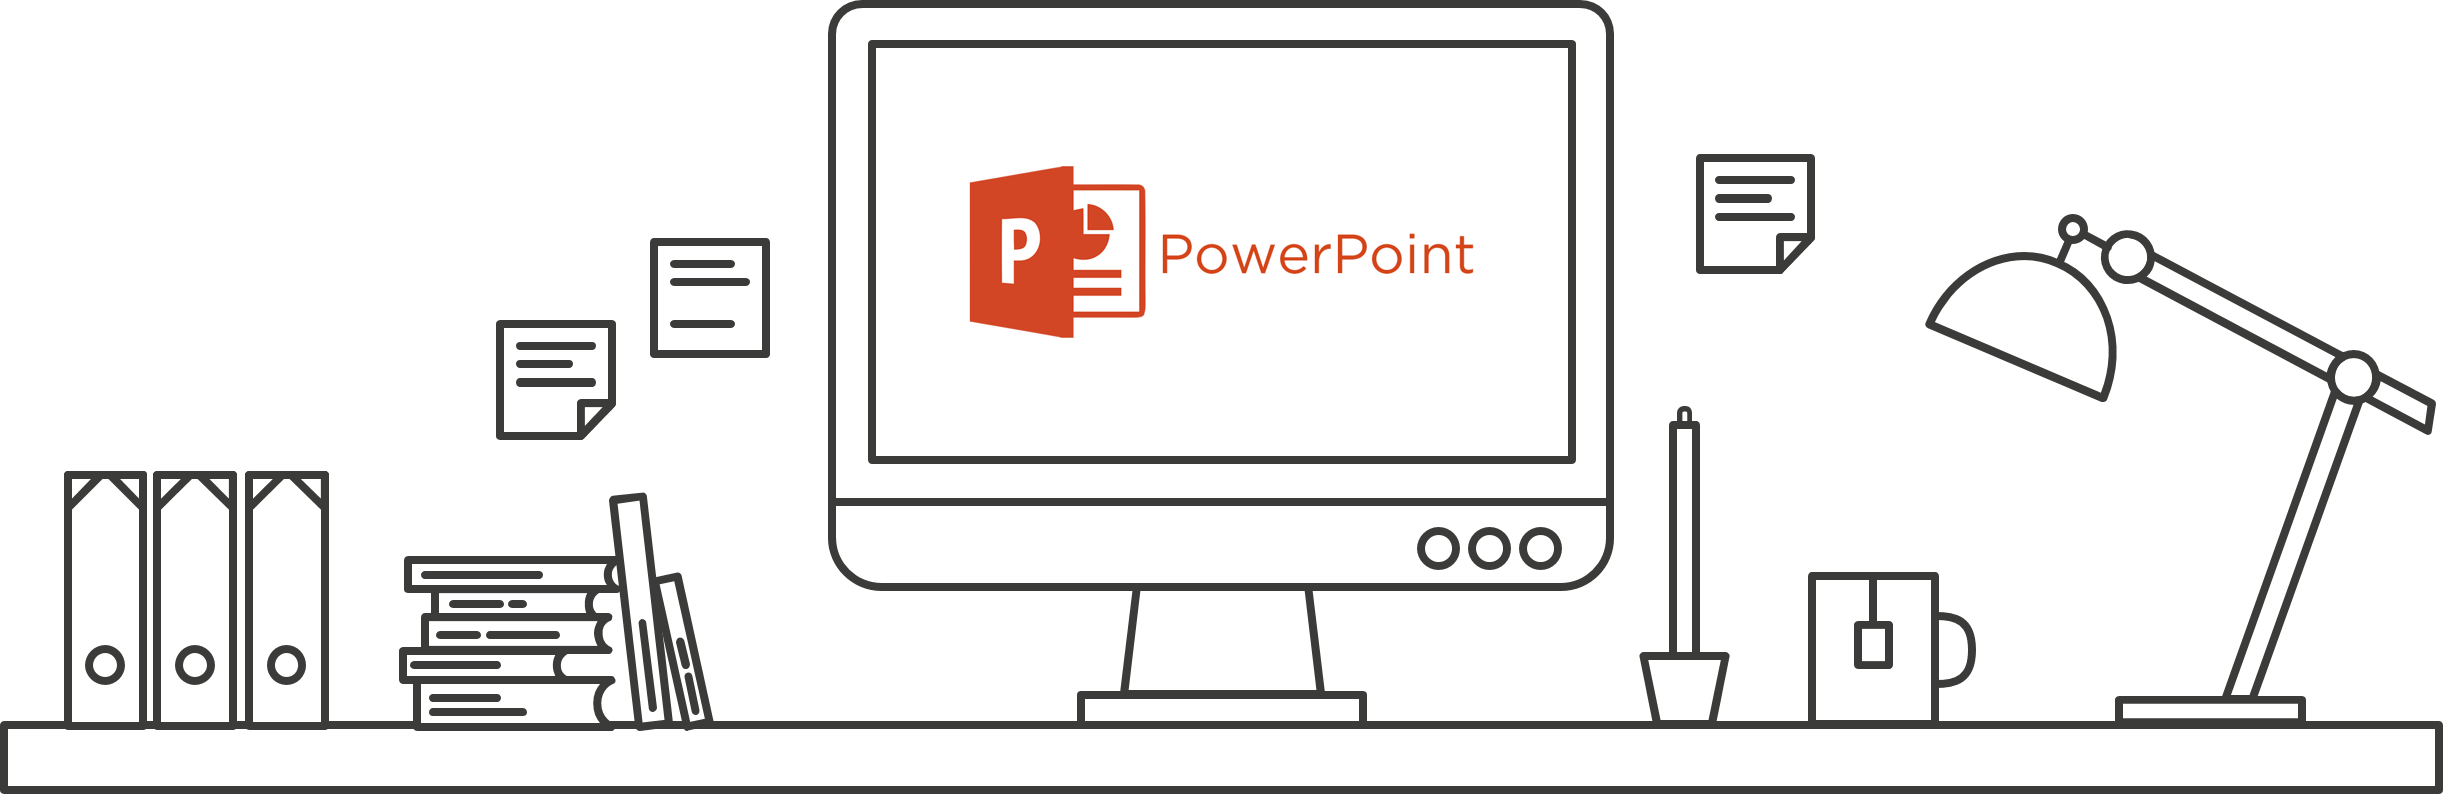 windows operating system ppt presentation